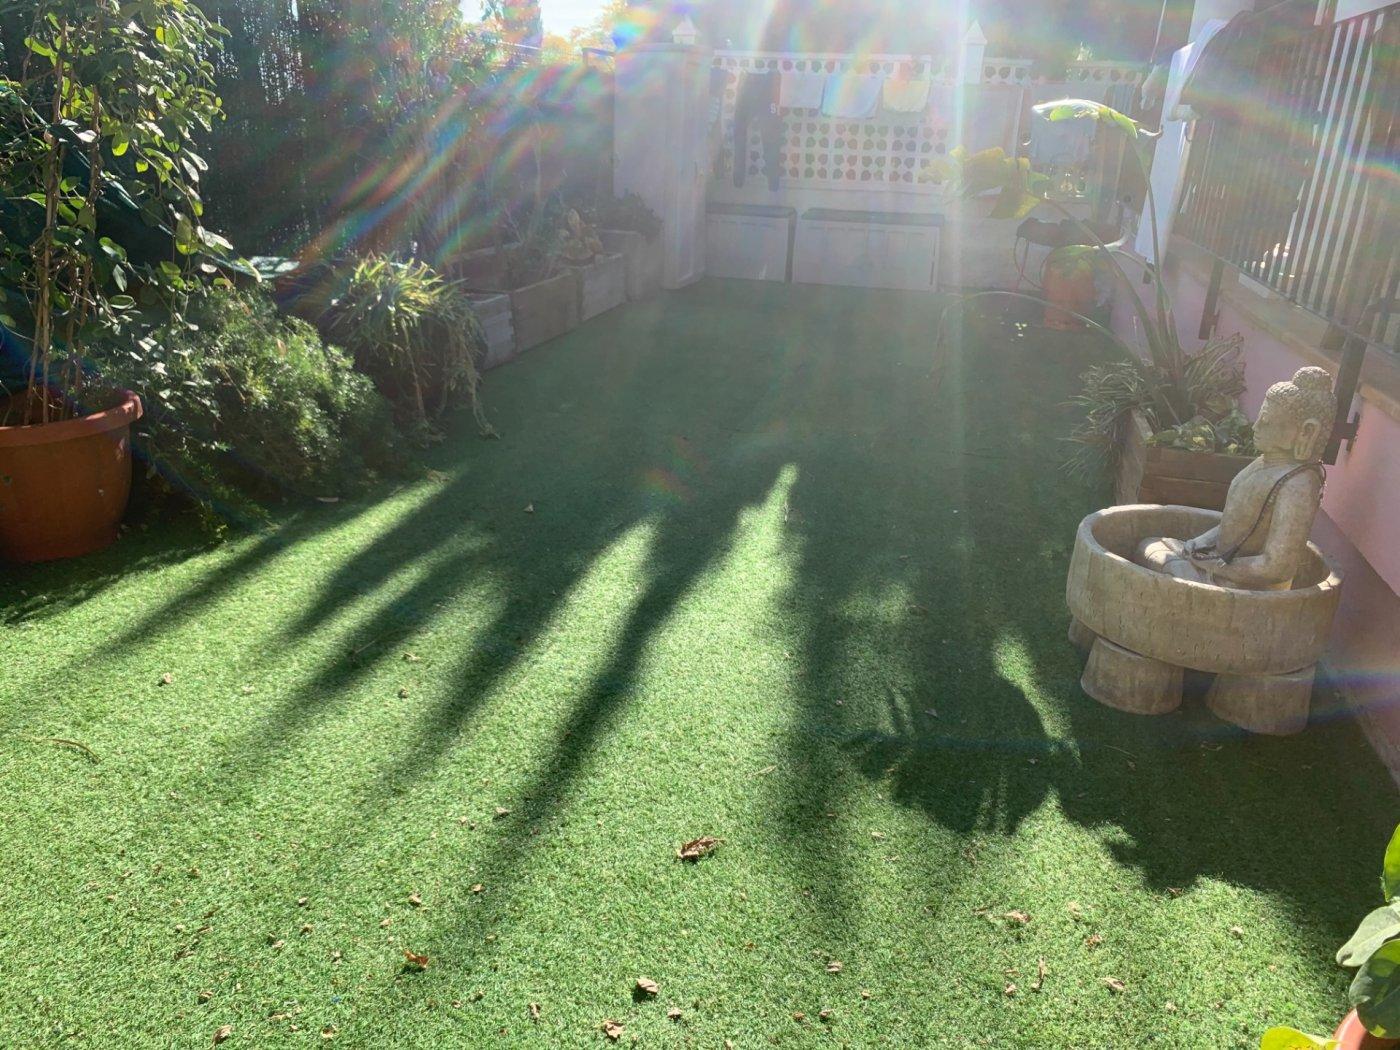 Planta baja adosada con jardin en bonalva - imagenInmueble21